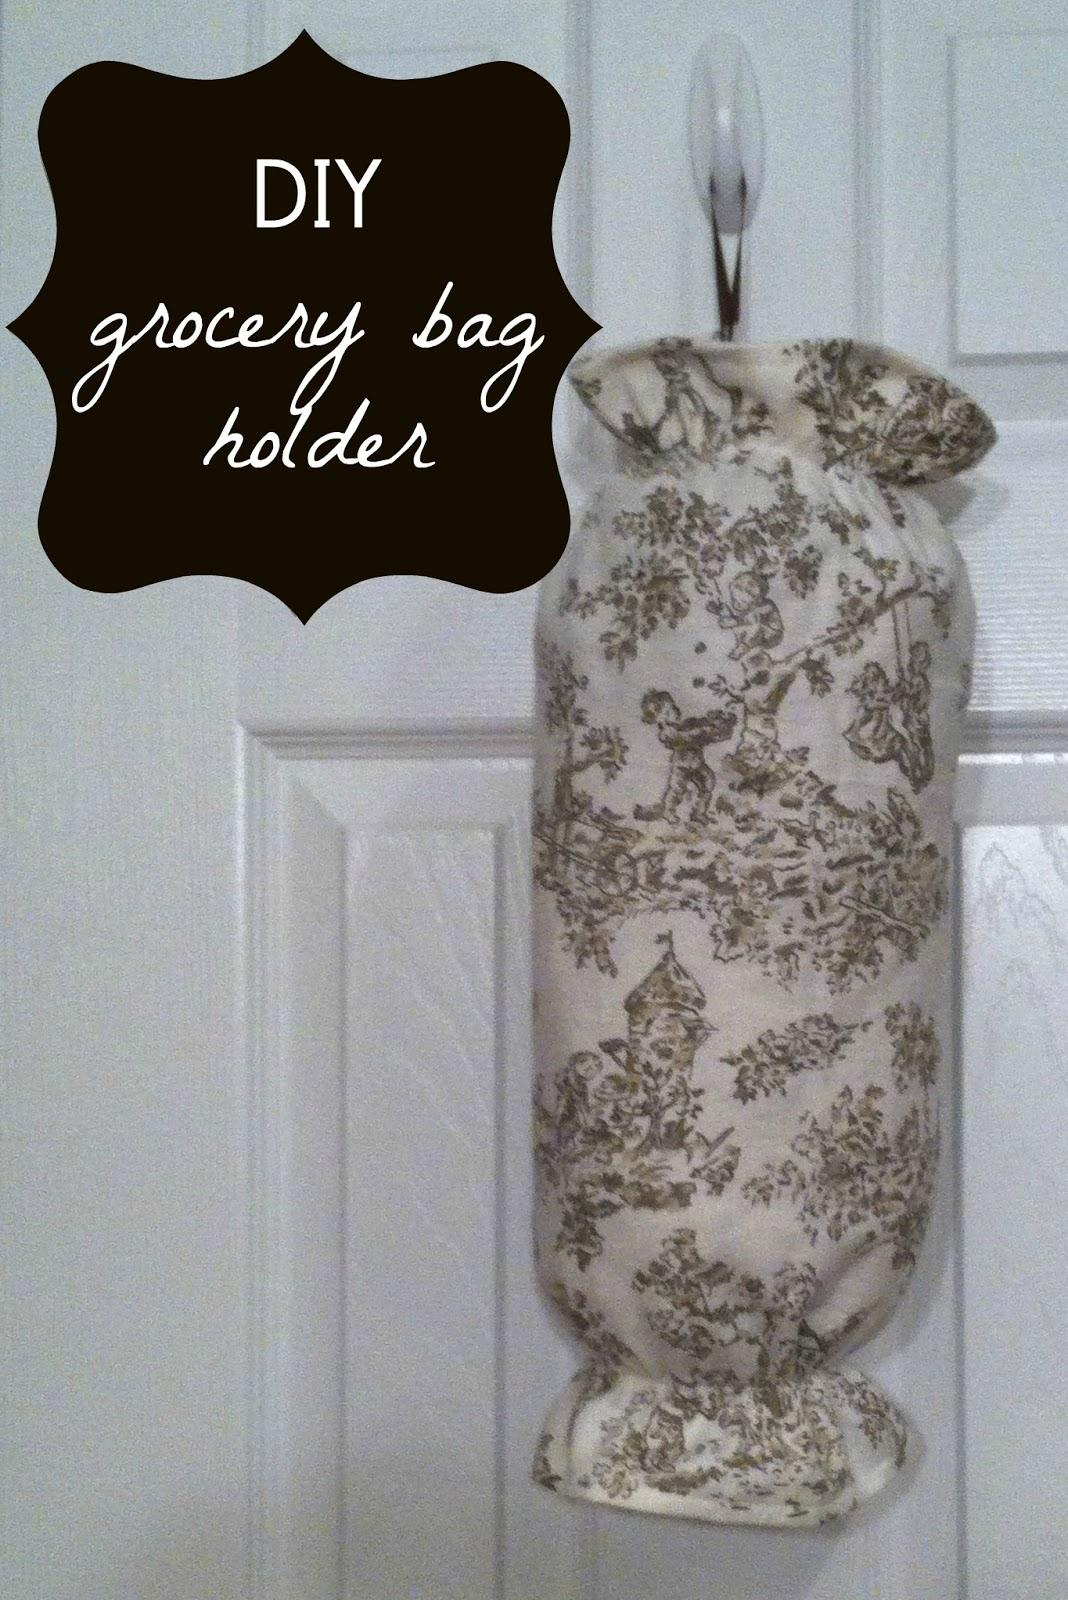 Notes from Kristen: Grocery Bag Holder {DIY}